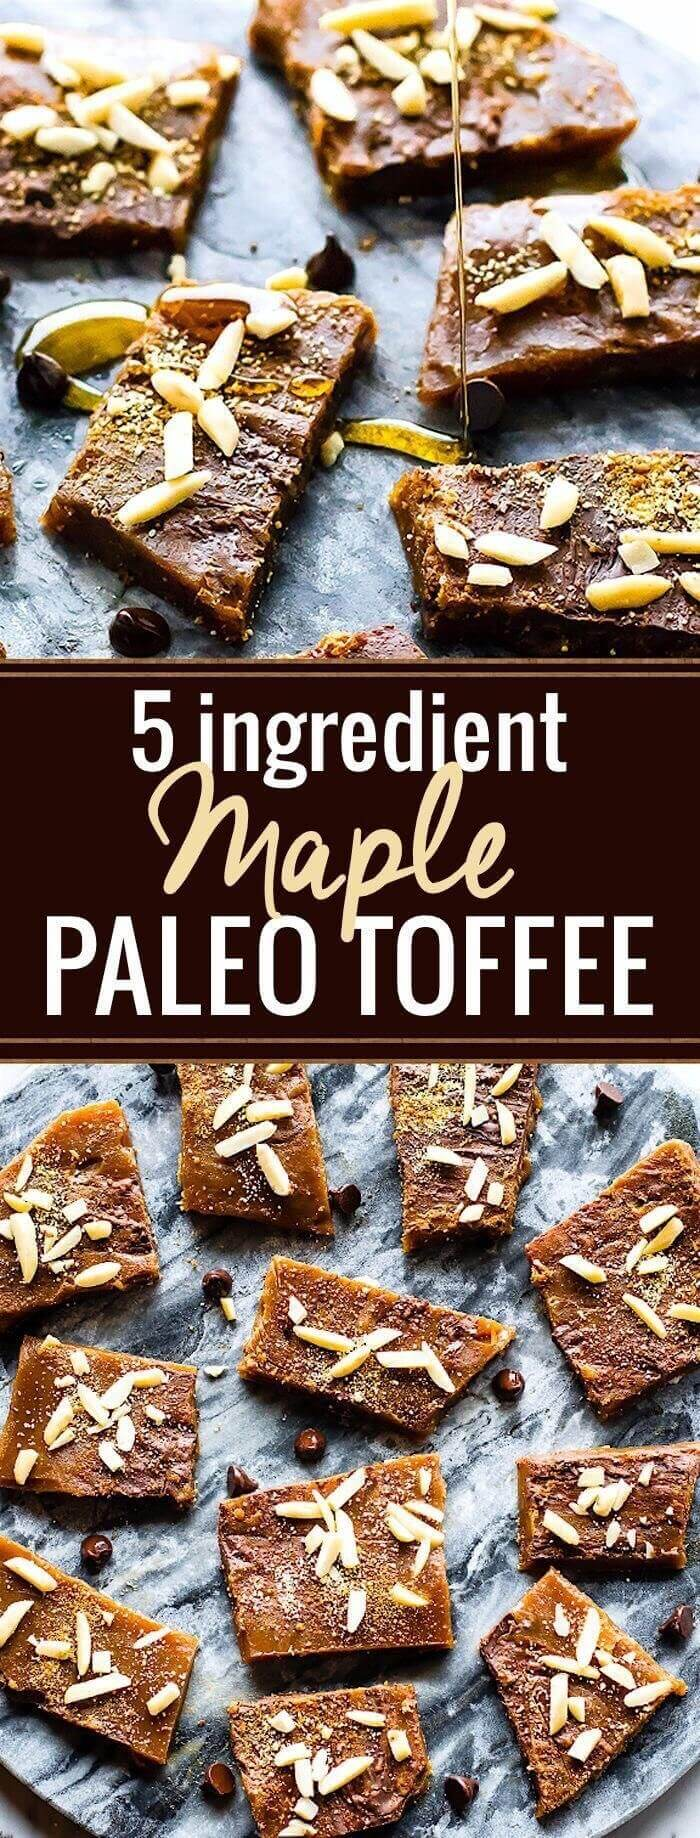 5-Ingredient Maple Paleo Toffee